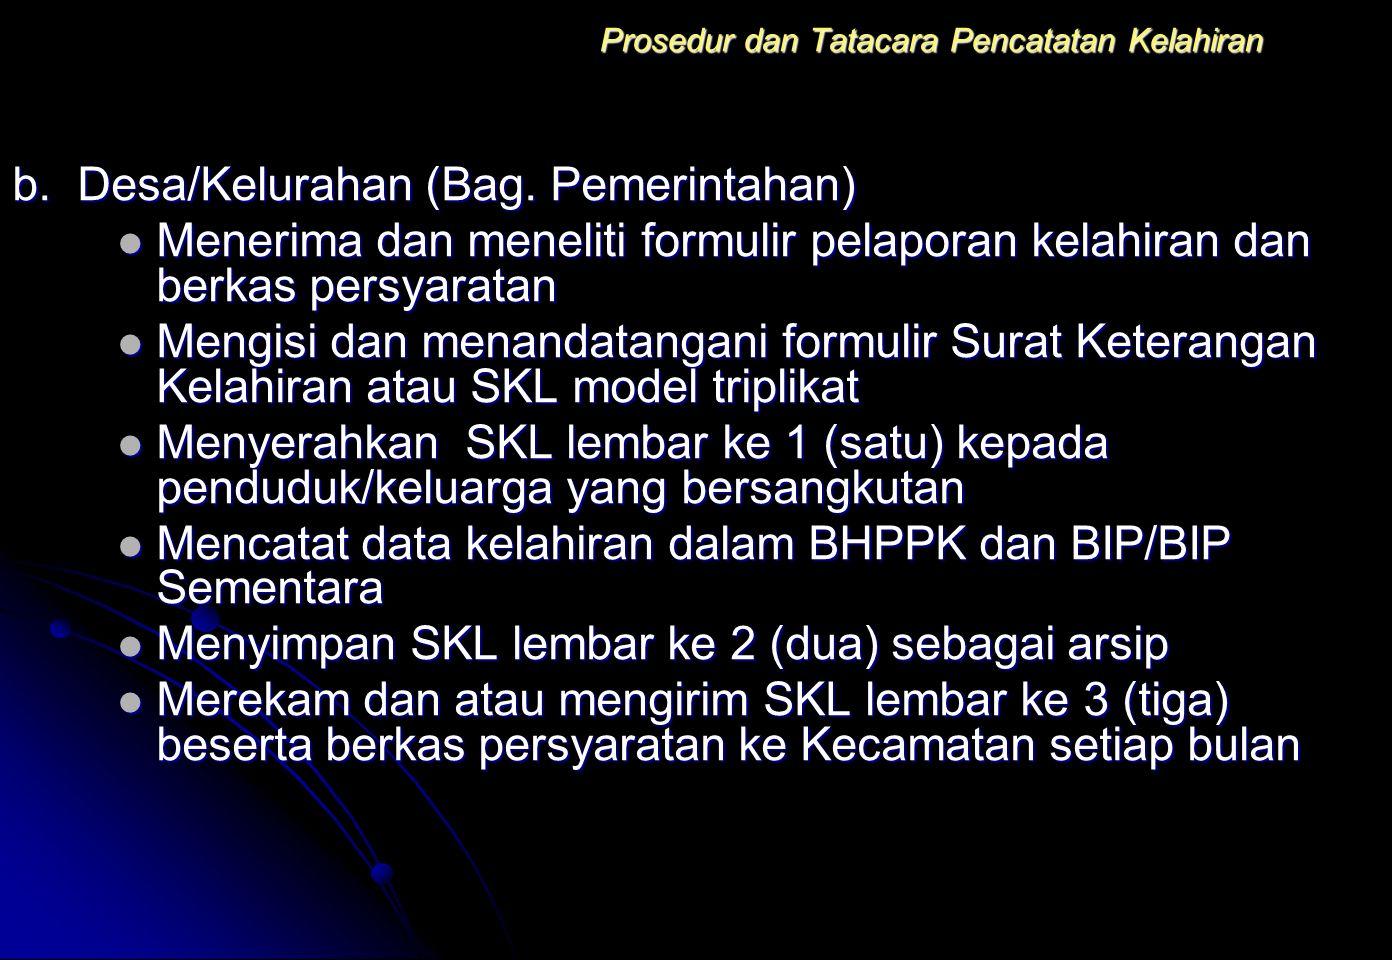 Prosedur dan Tatacara Pencatatan Kelahiran b. Desa/Kelurahan (Bag. Pemerintahan) Menerima dan meneliti formulir pelaporan kelahiran dan berkas persyar